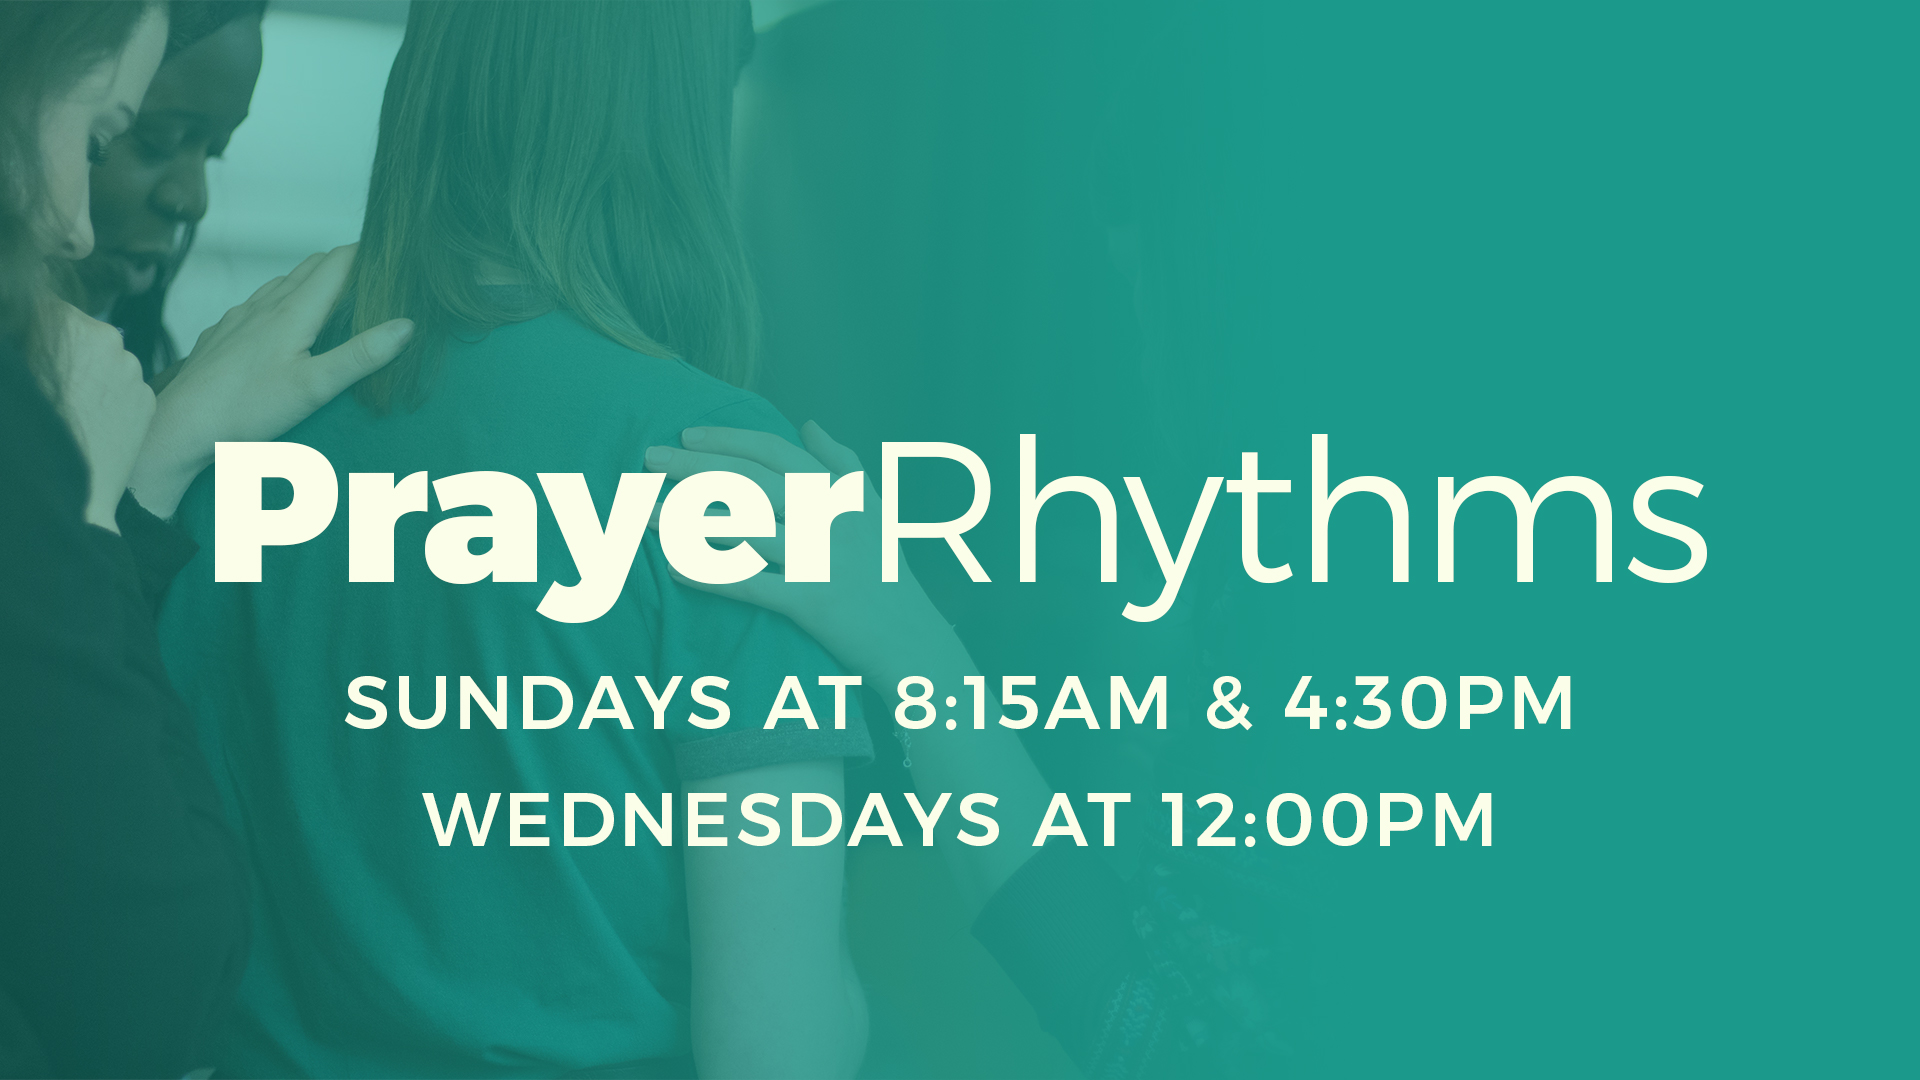 PrayerRhythms.jpg